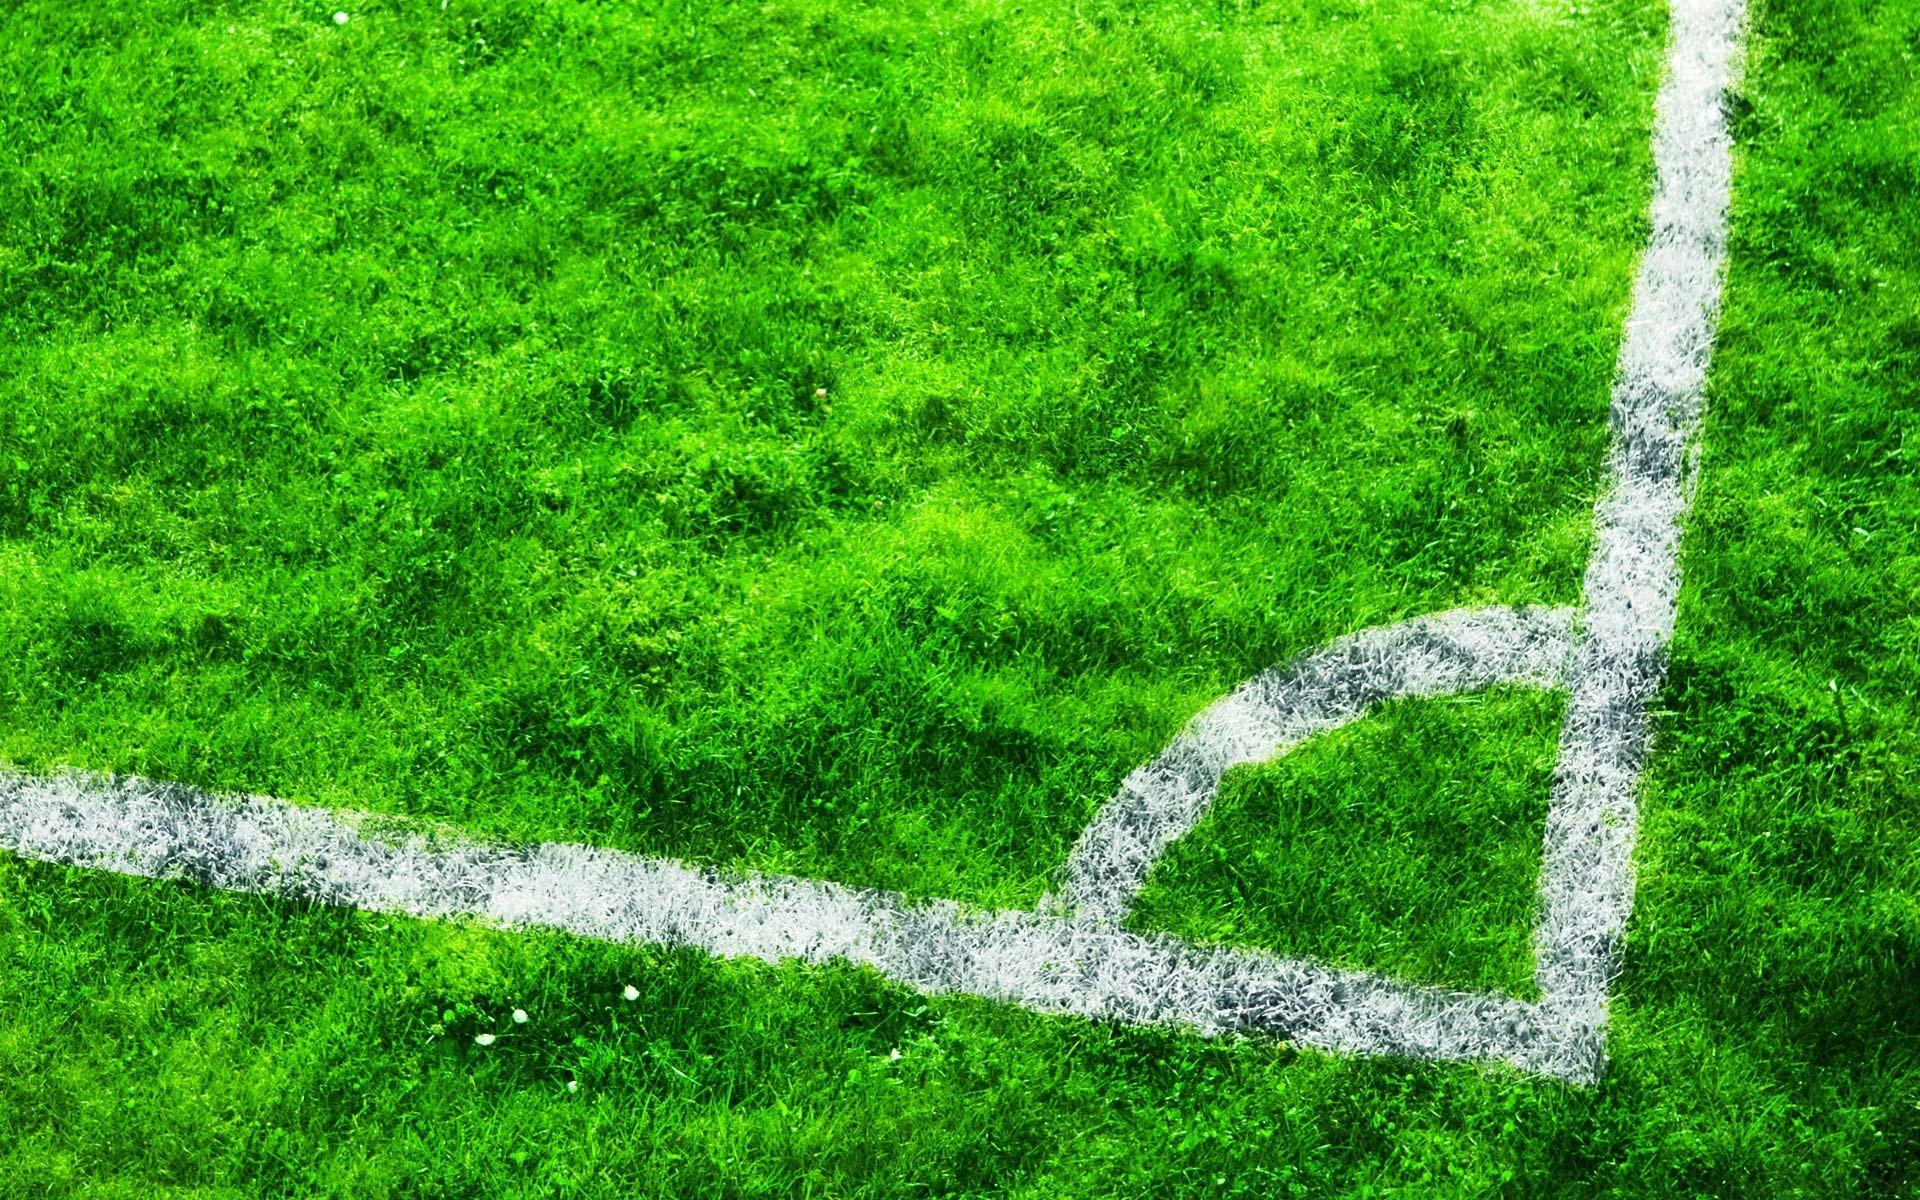 Football Stadium Grass Wallpaper